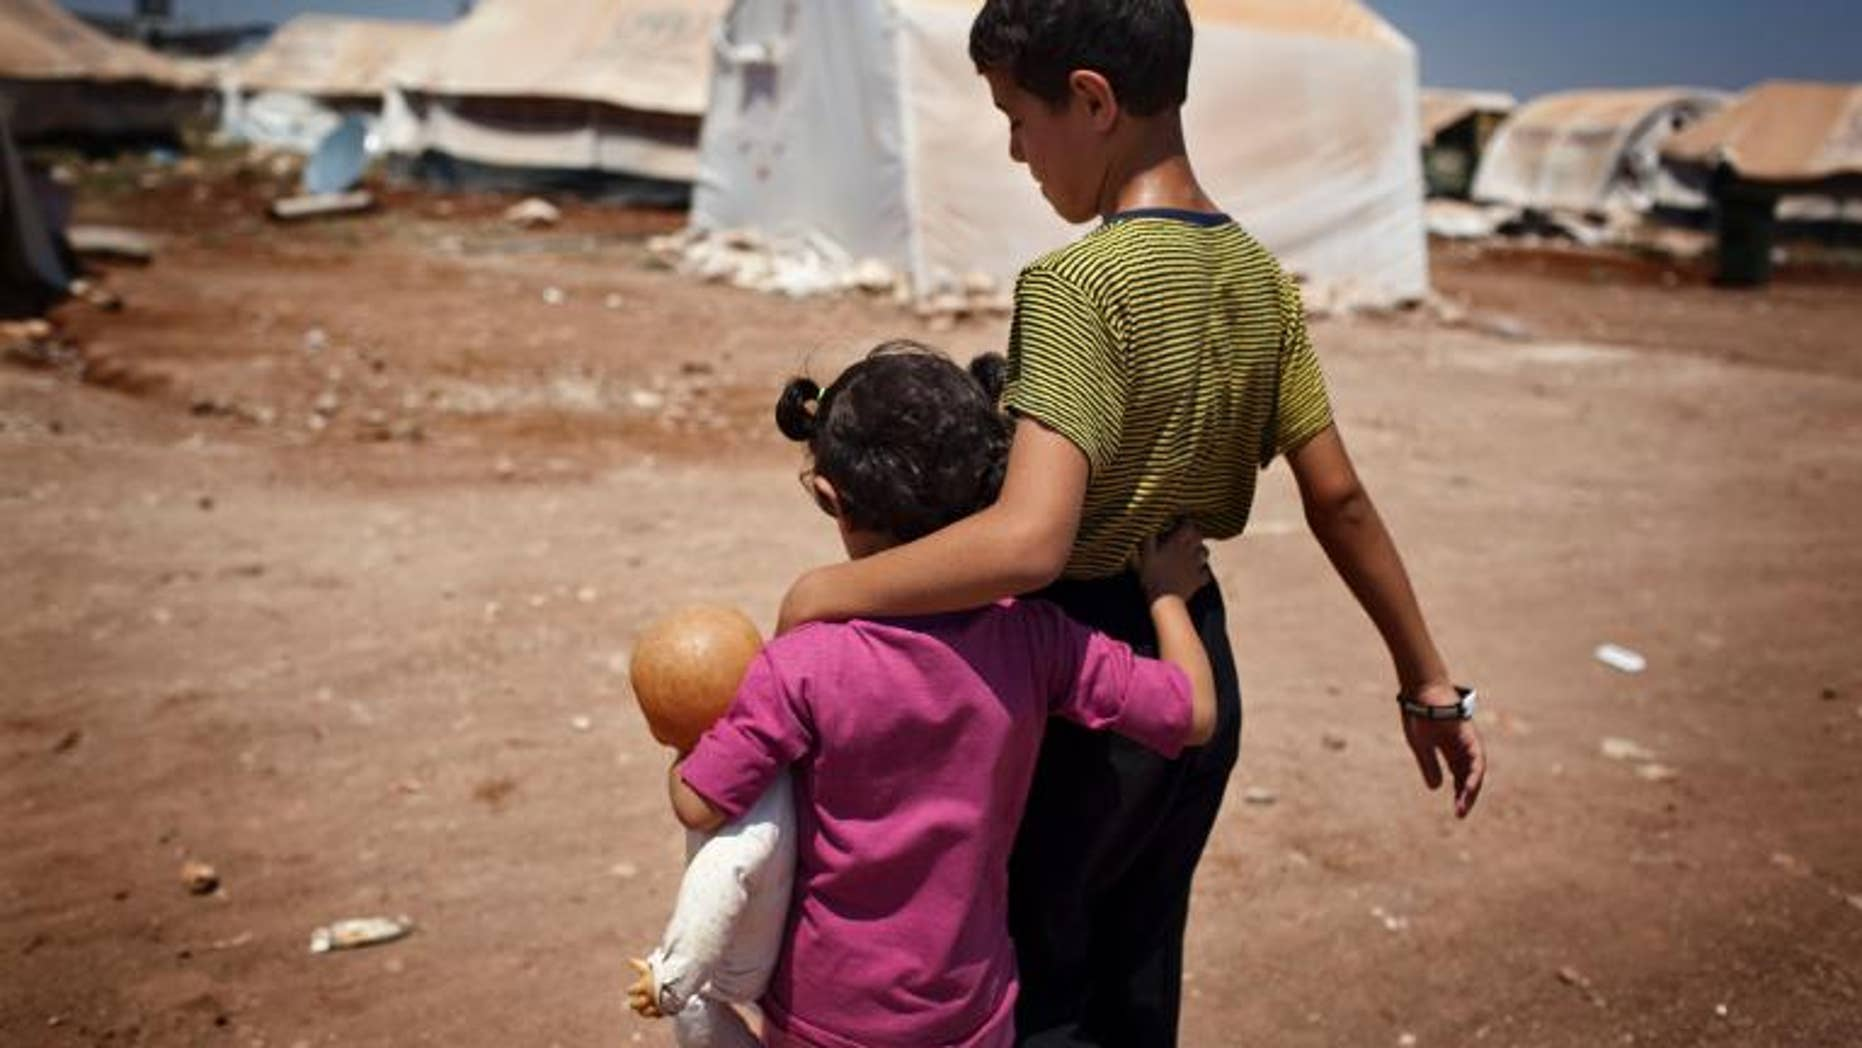 Syrian children walk in the Bab al-Salam refugee camp in Azaz on July 15, 2013